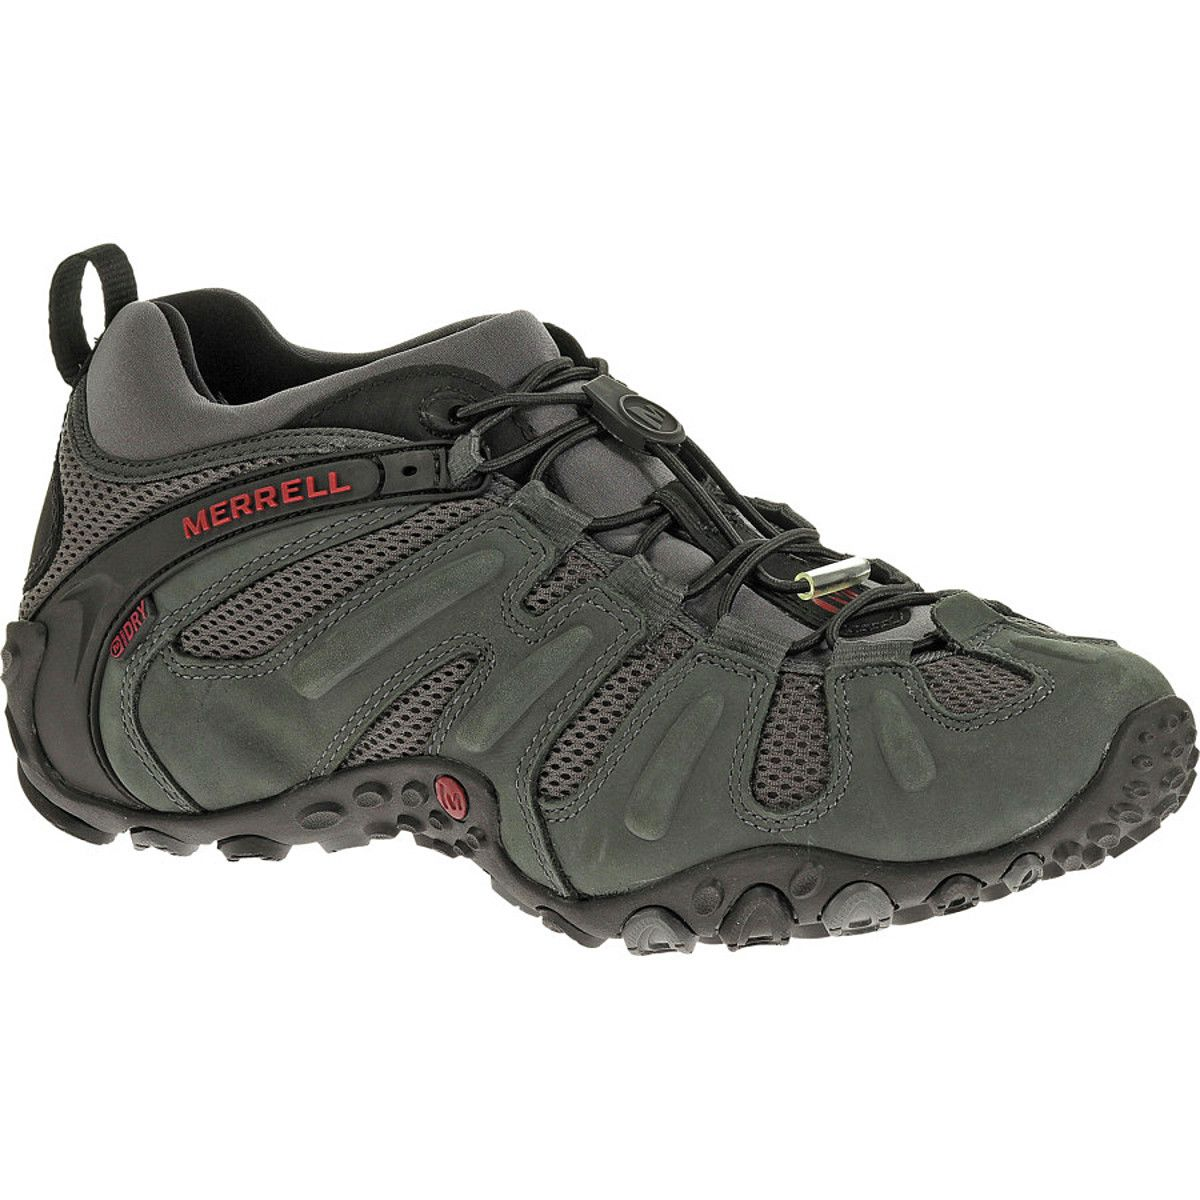 Merrell Chameleon Prime Stretch Waterproof Hiking Shoe - Men